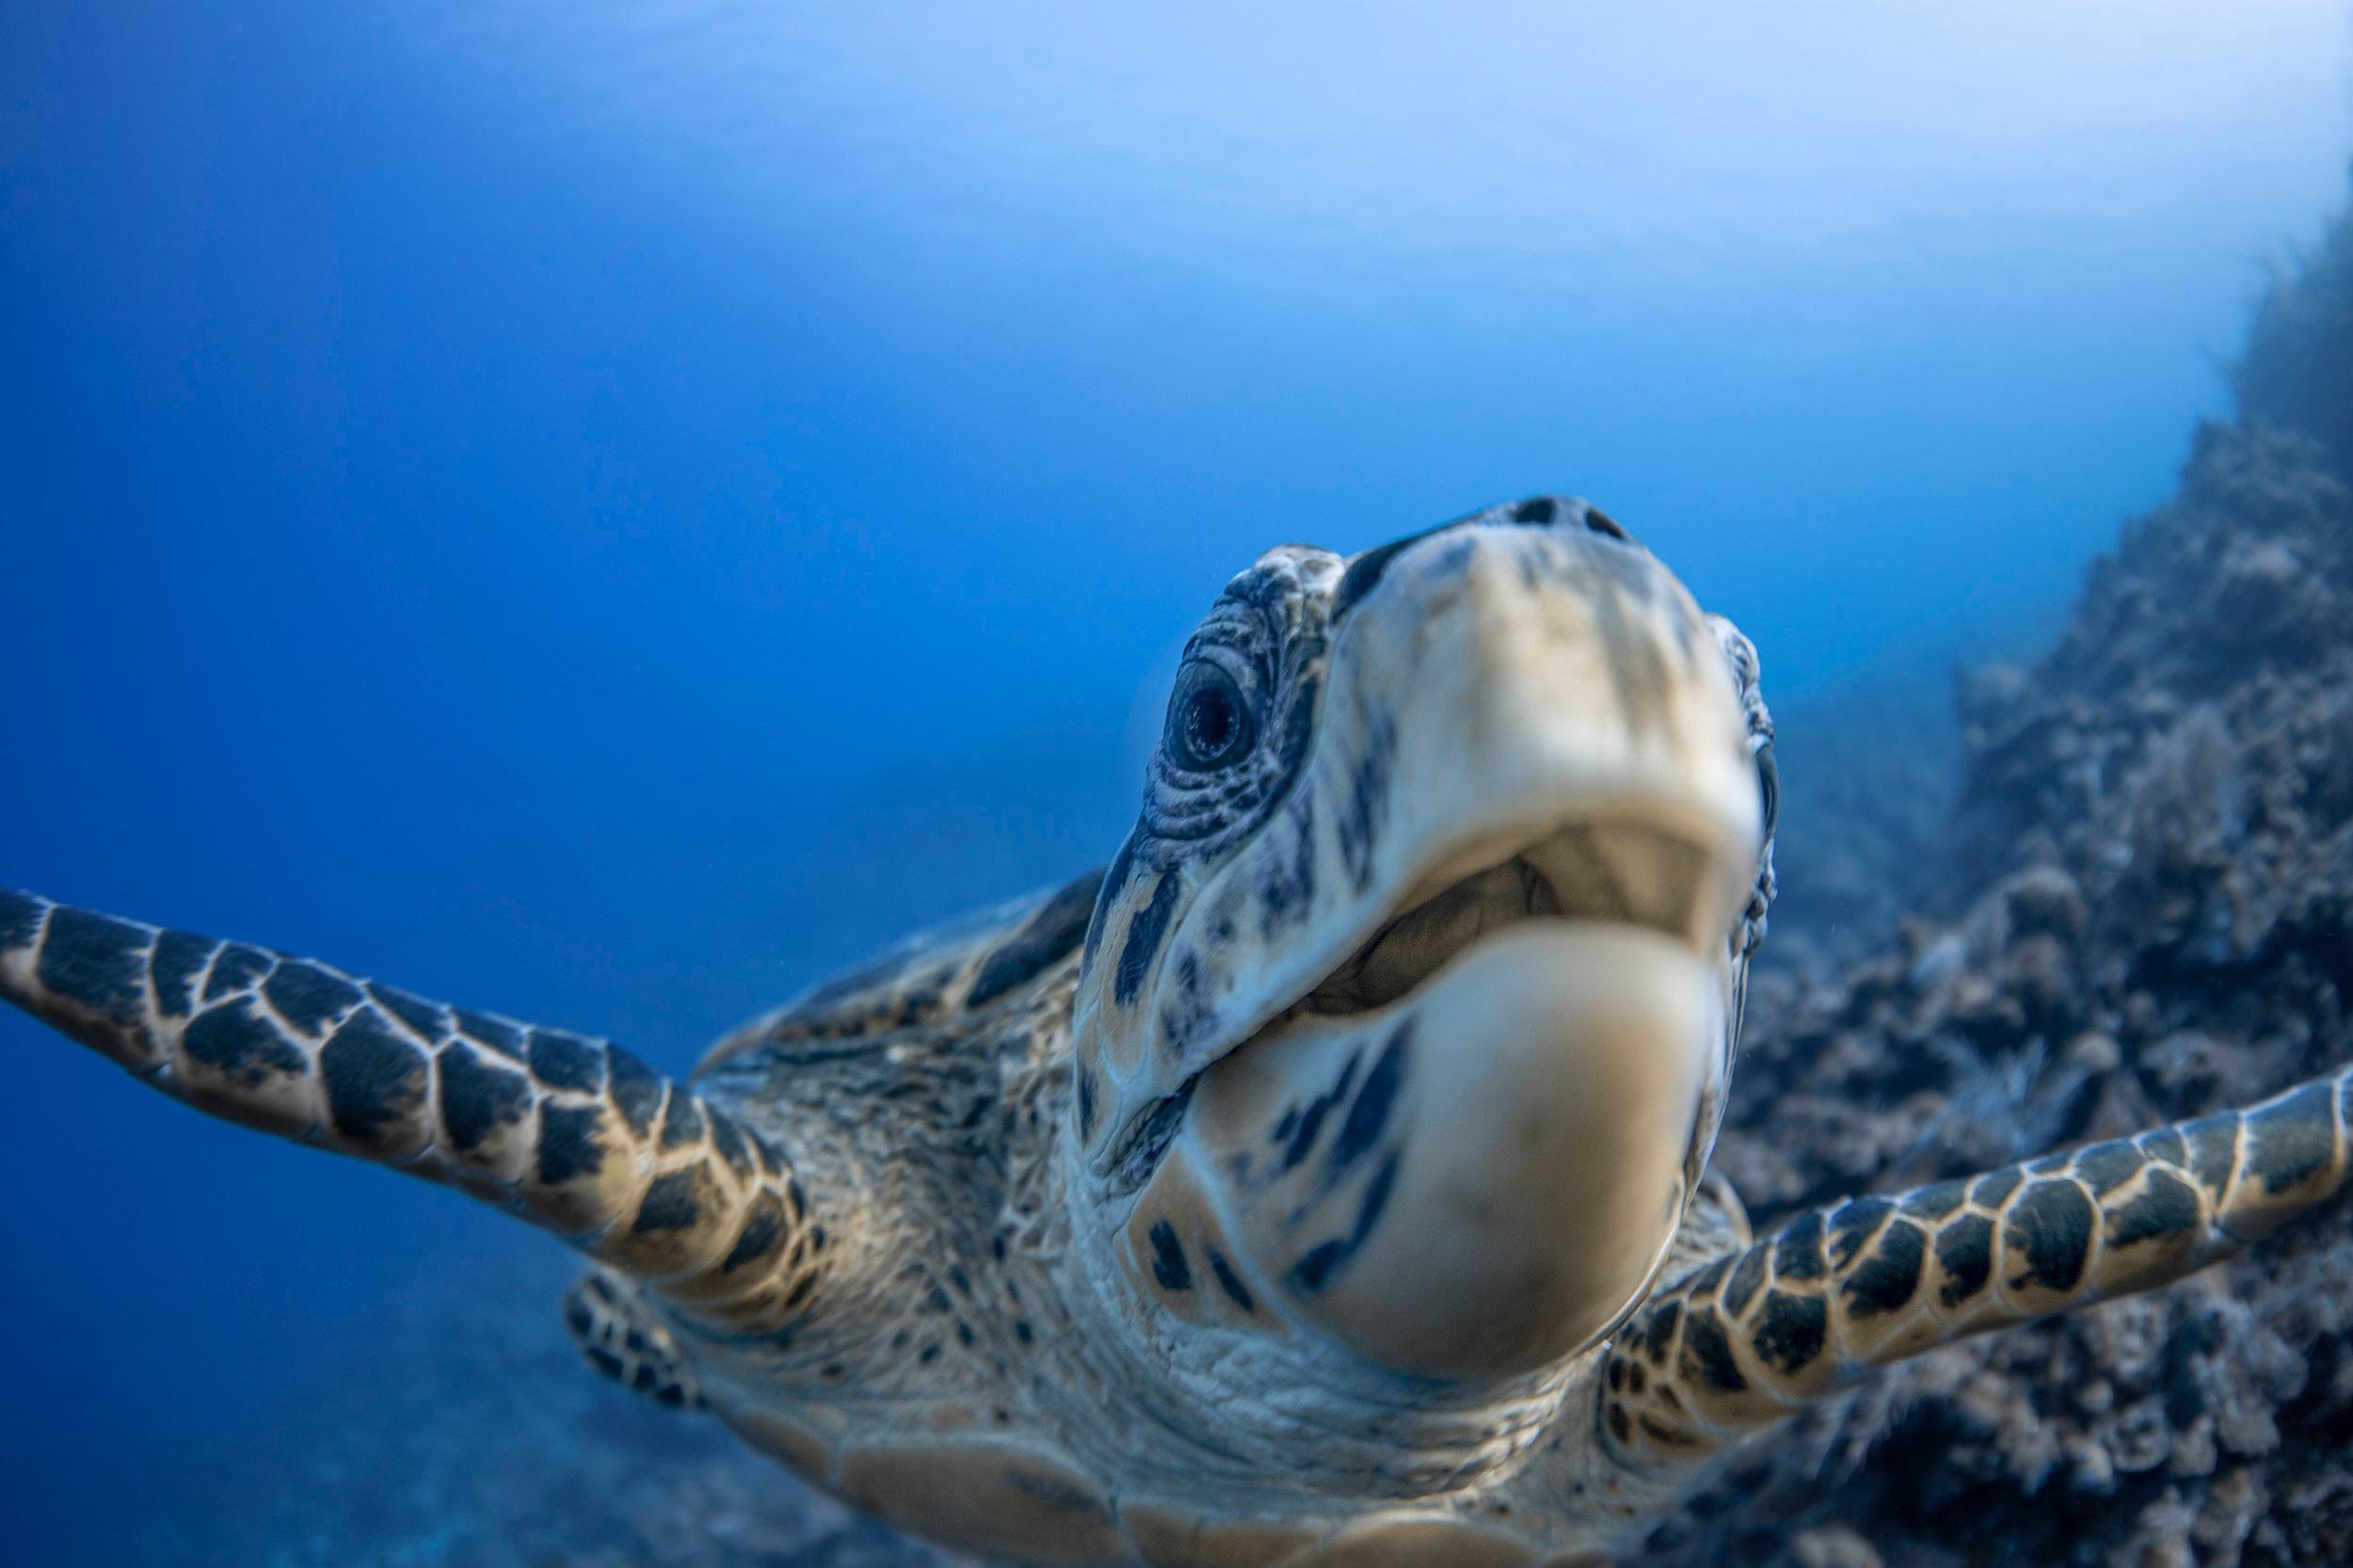 Turtle in the cayman islands CREDIT: Jason Washington / Coral Reef Image Bank